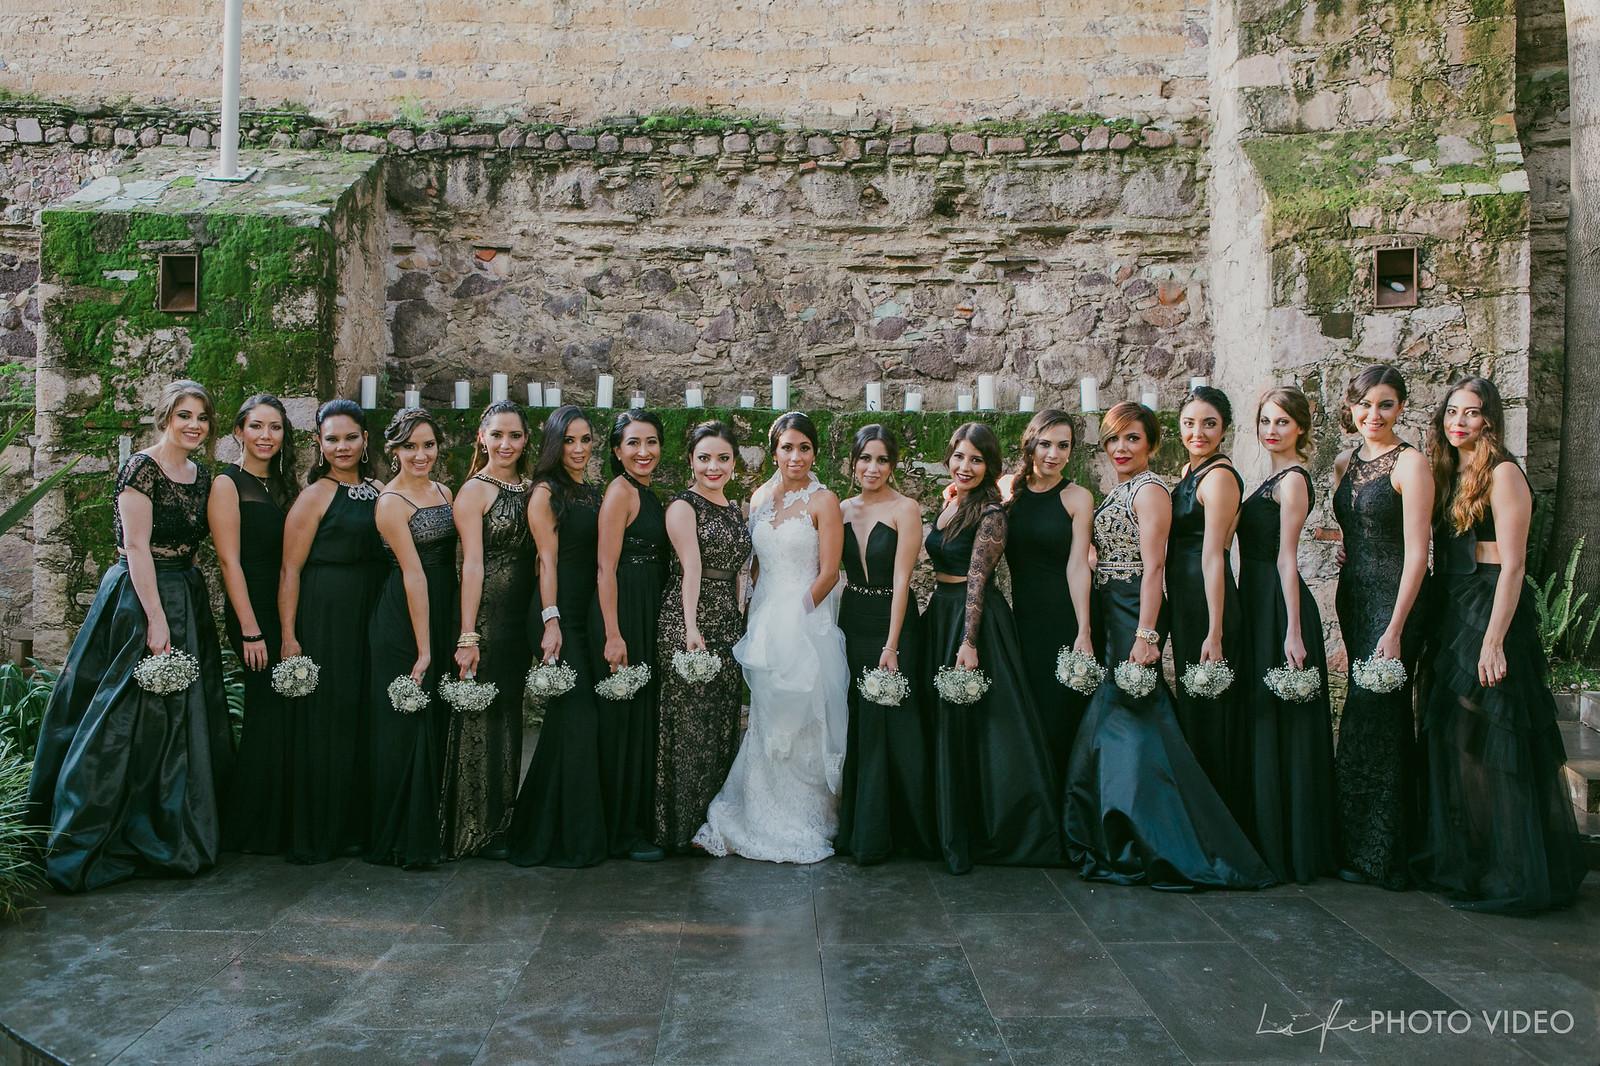 LifePhotoVideo_Boda_Guanajuato_Wedding_0031